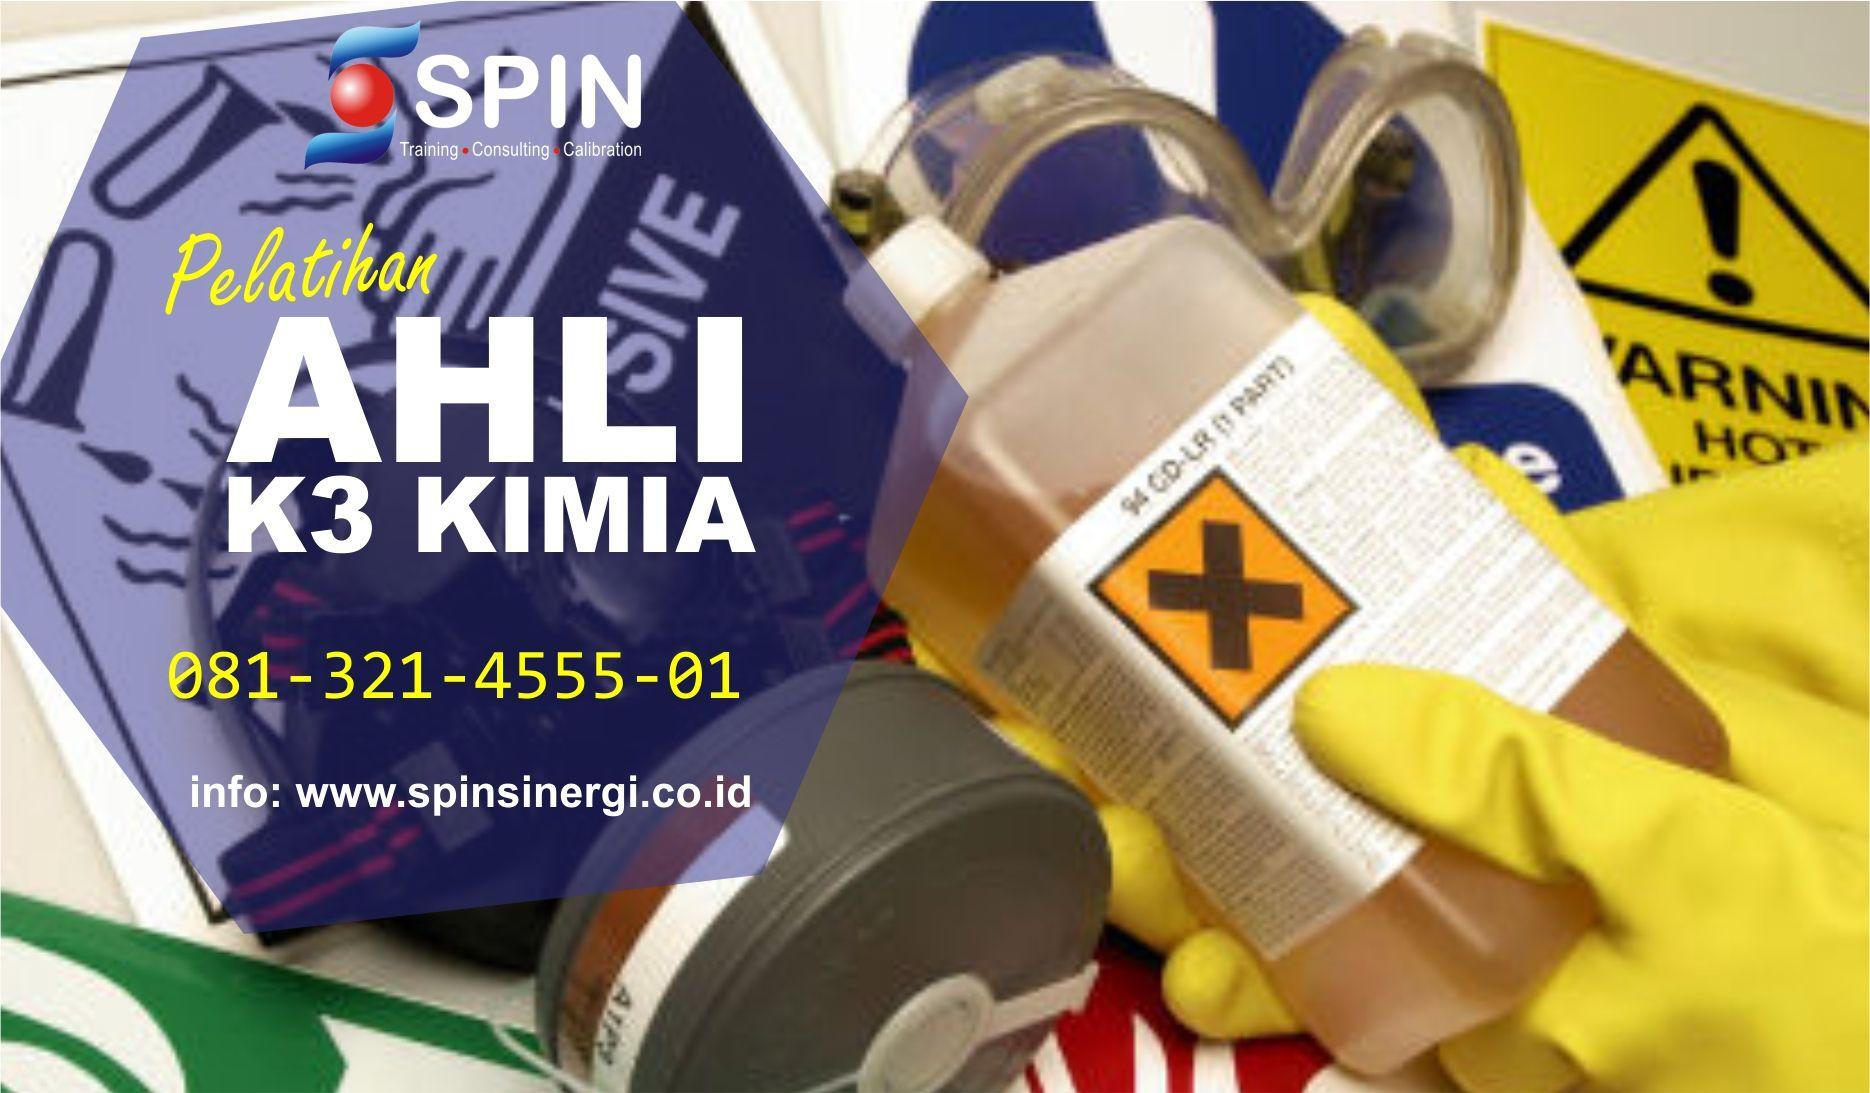 081 321 4555 01 Training Spinsinergi Com Info K3 Kimia Peran K3 Kimia Keselamatan Dan Kesehatan Kerja K3 Kimia Audit K3 Kimia Kimia Latihan Investigasi